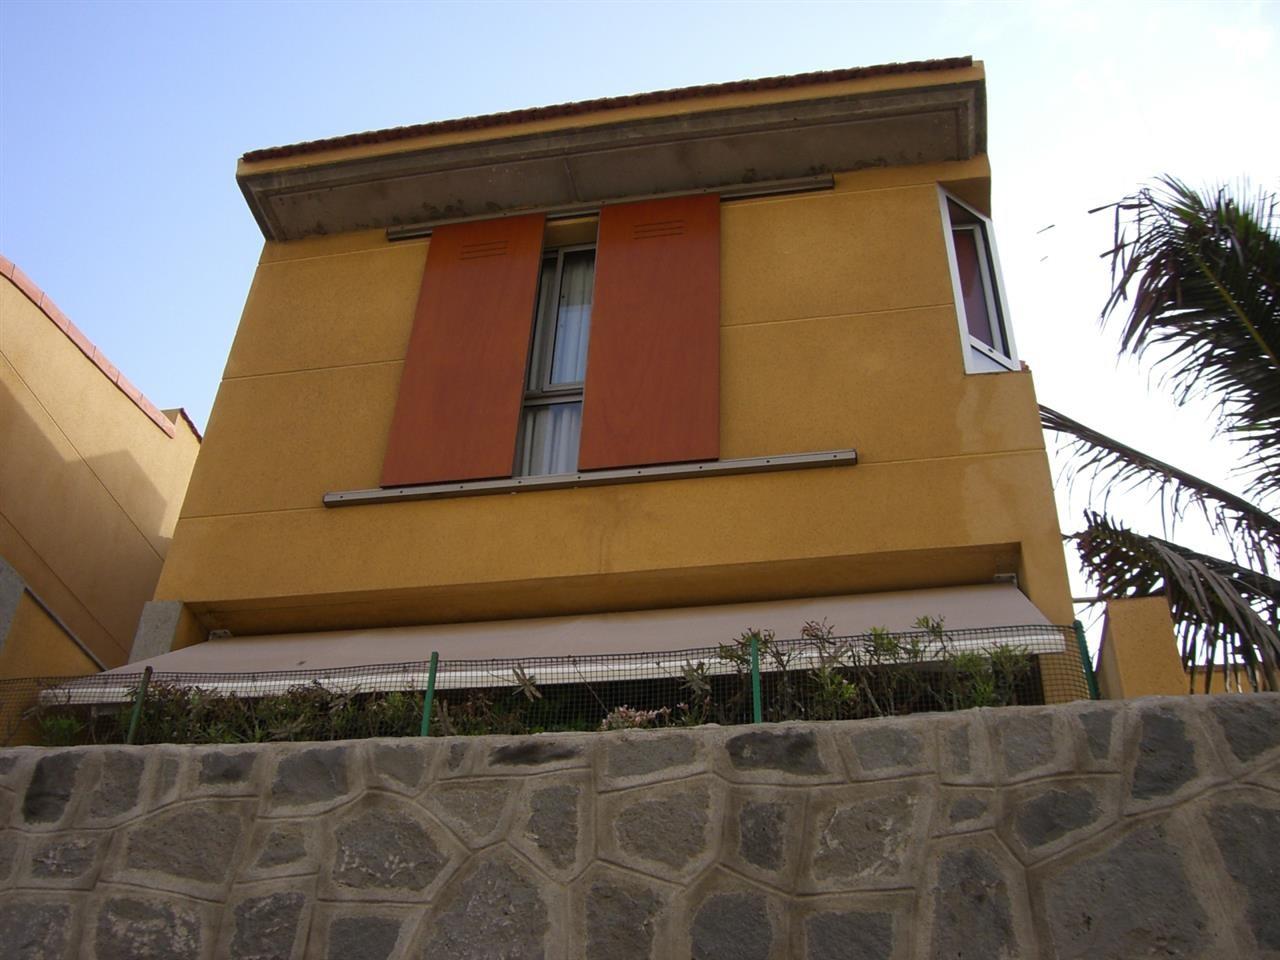 For sale in El Medano, Tenerife